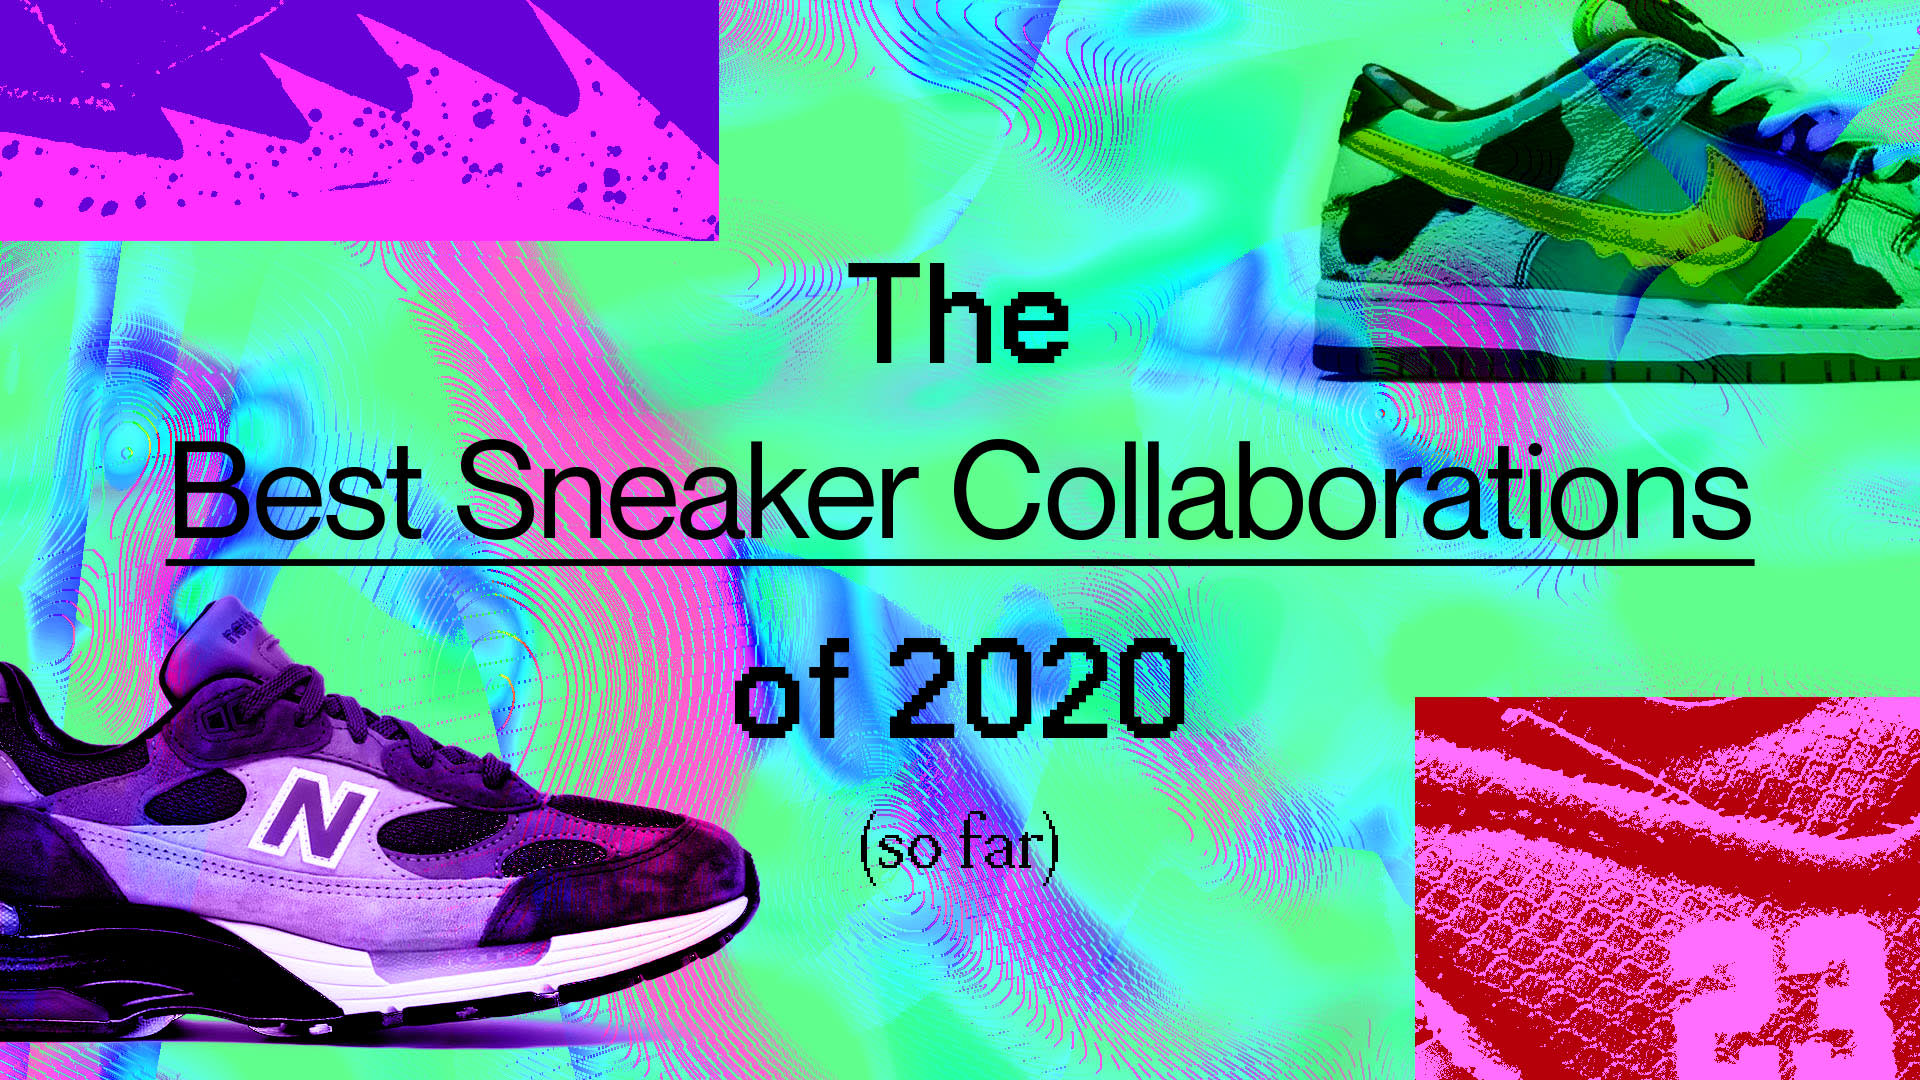 Best Sneaker Collabs 2020 so far